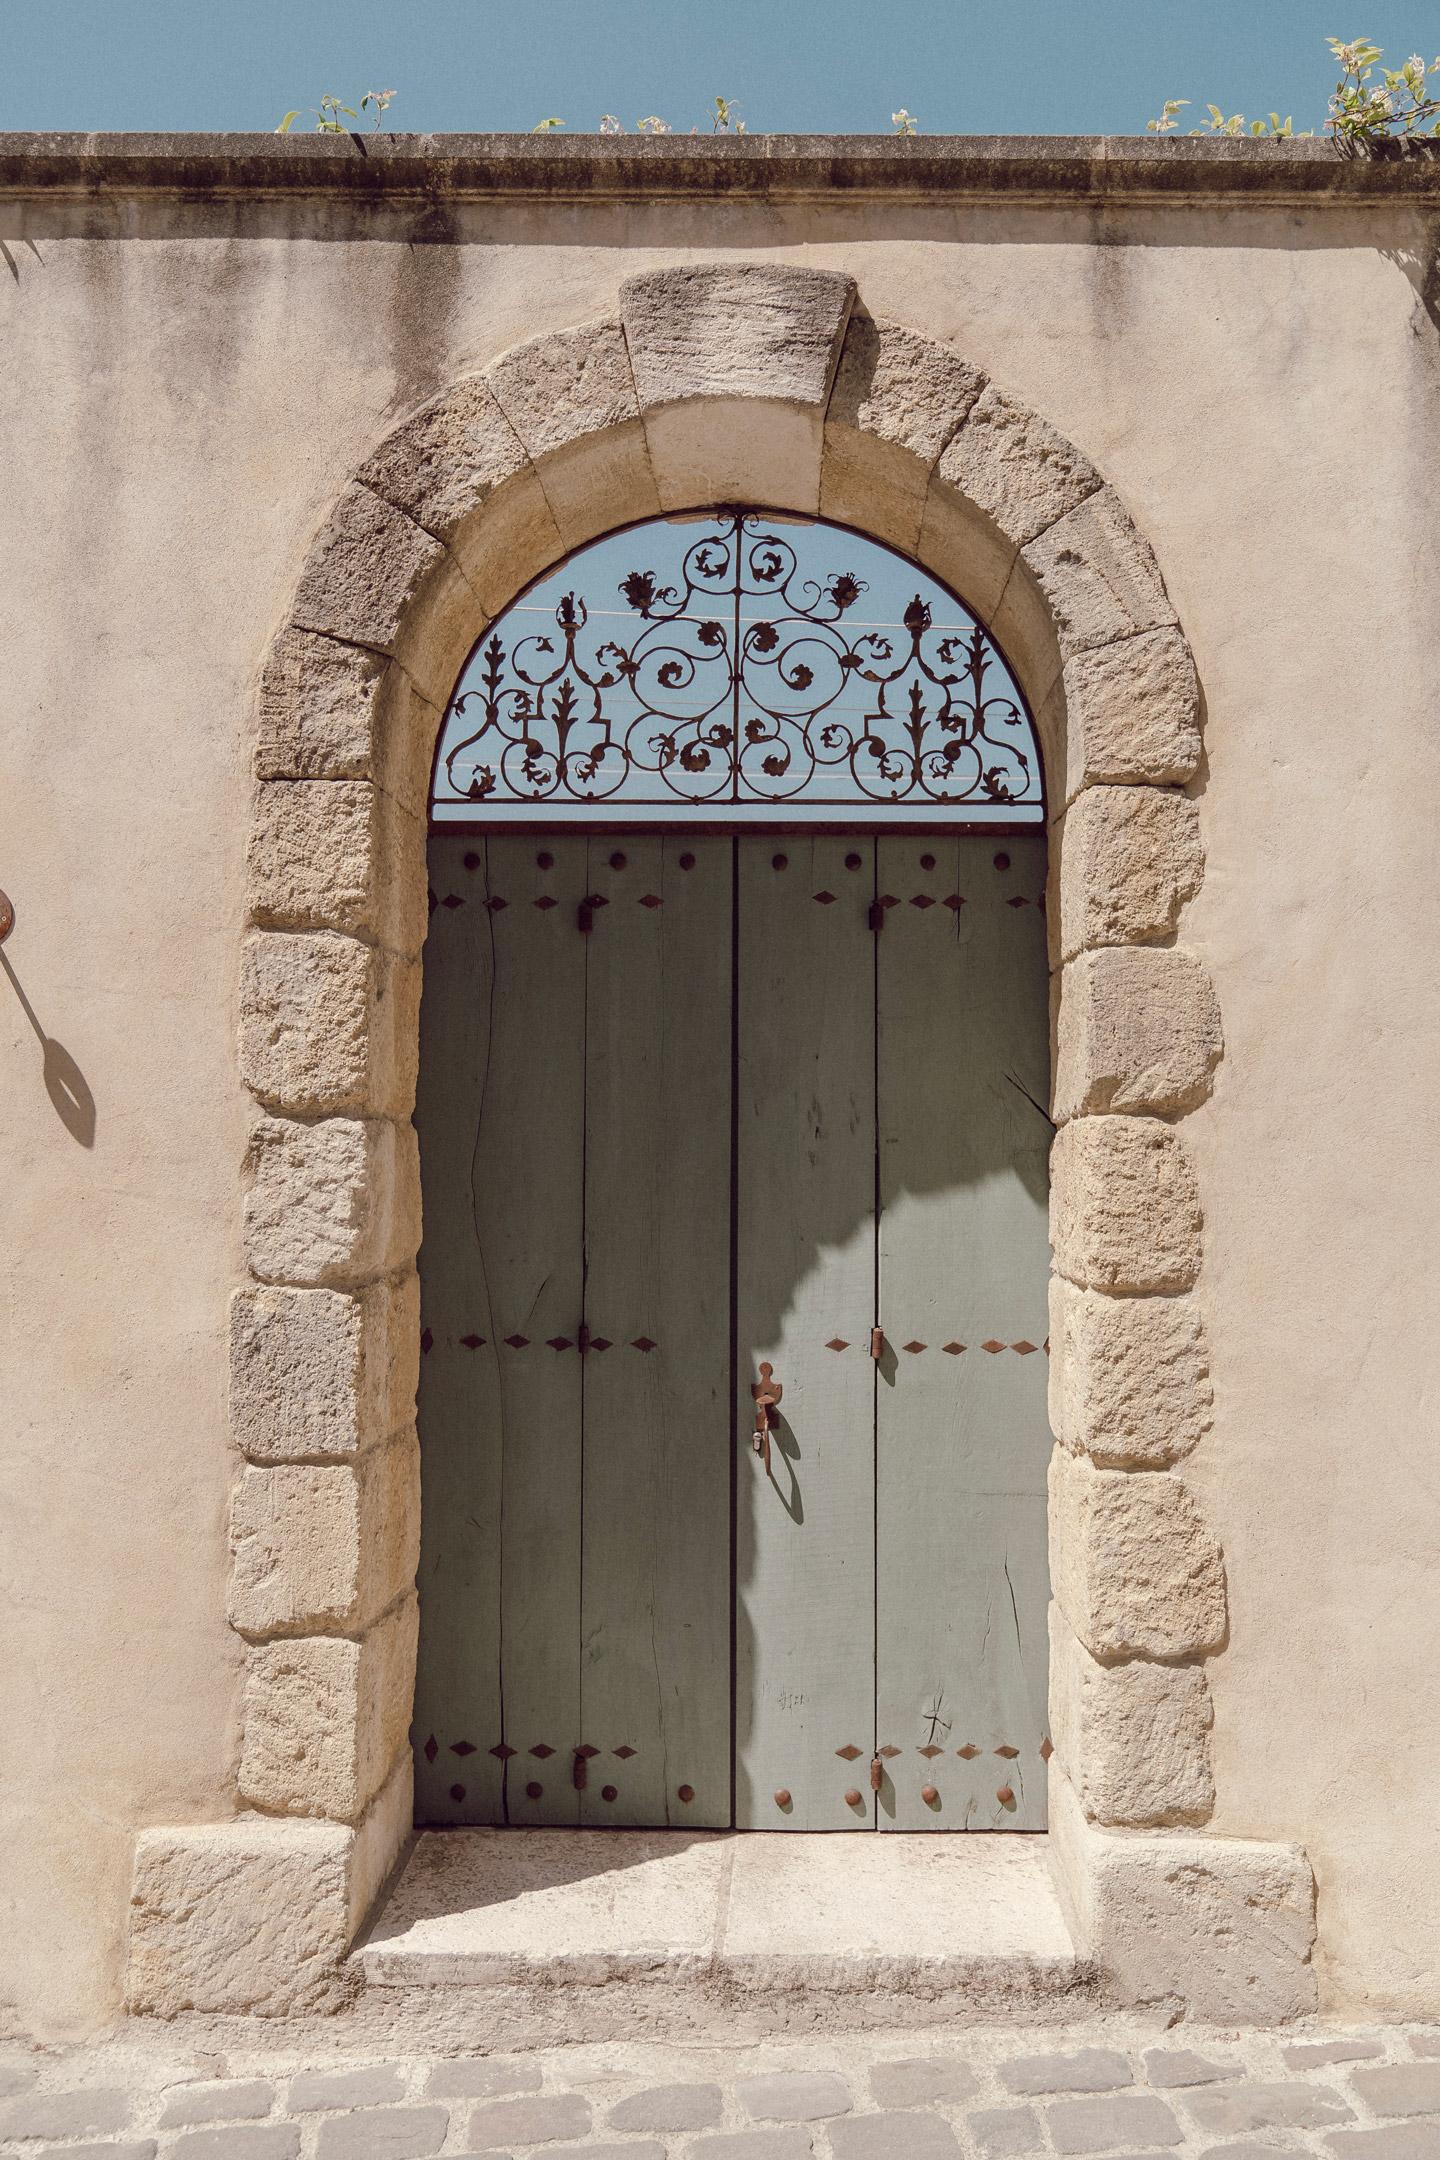 provence-menerbes-oppede-isle-sur-la-sorgue-22